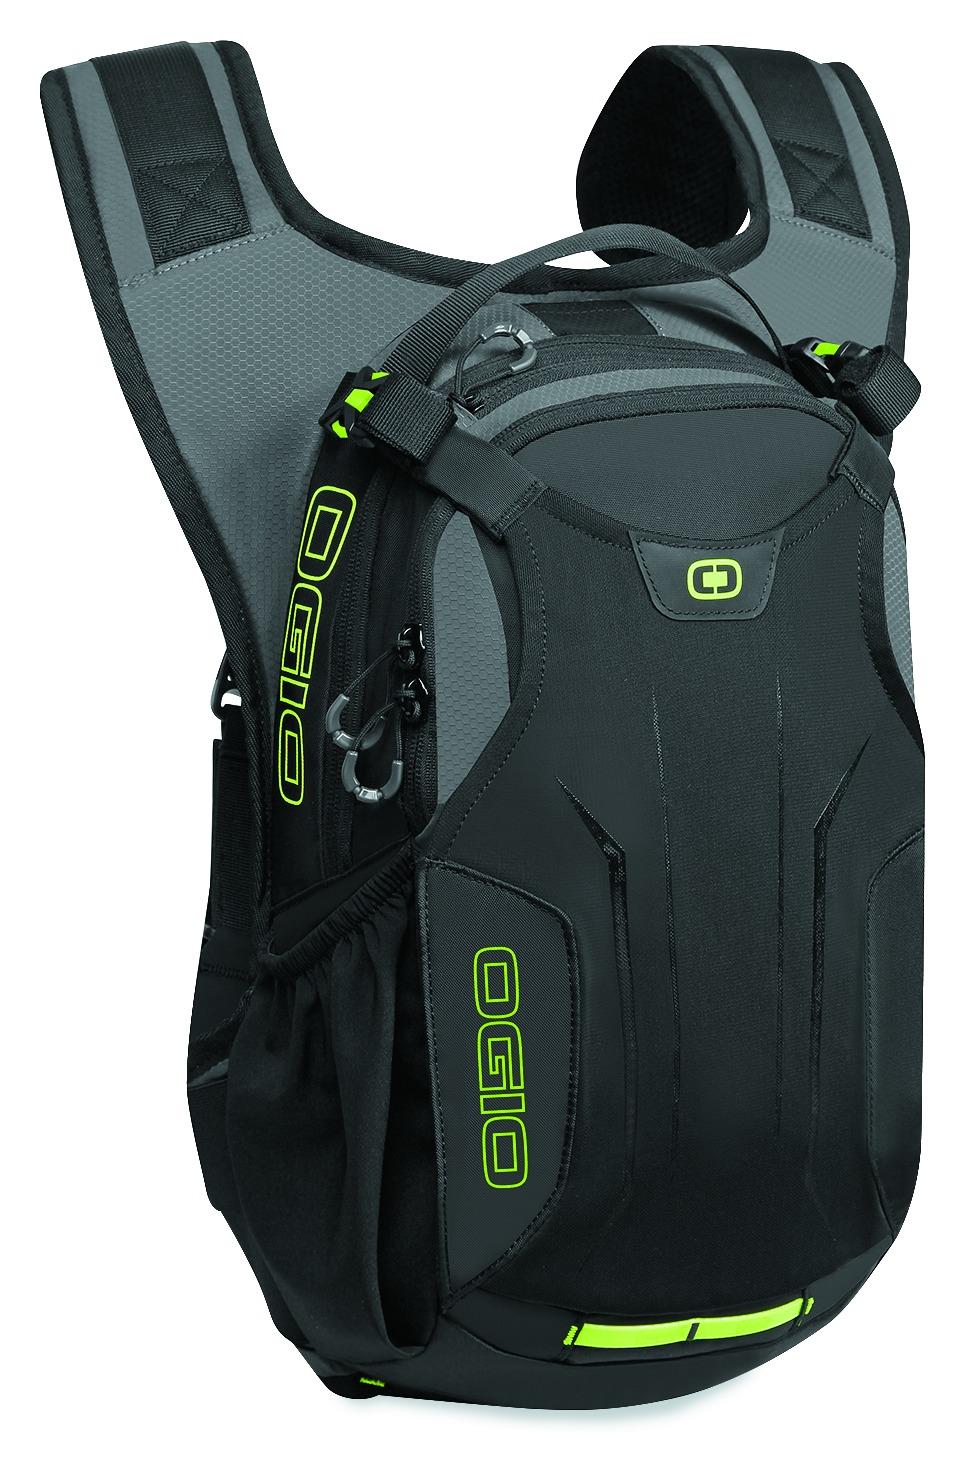 OGIO Baja 2L Hydration Pack - Cycle Gear a79cf6c10574